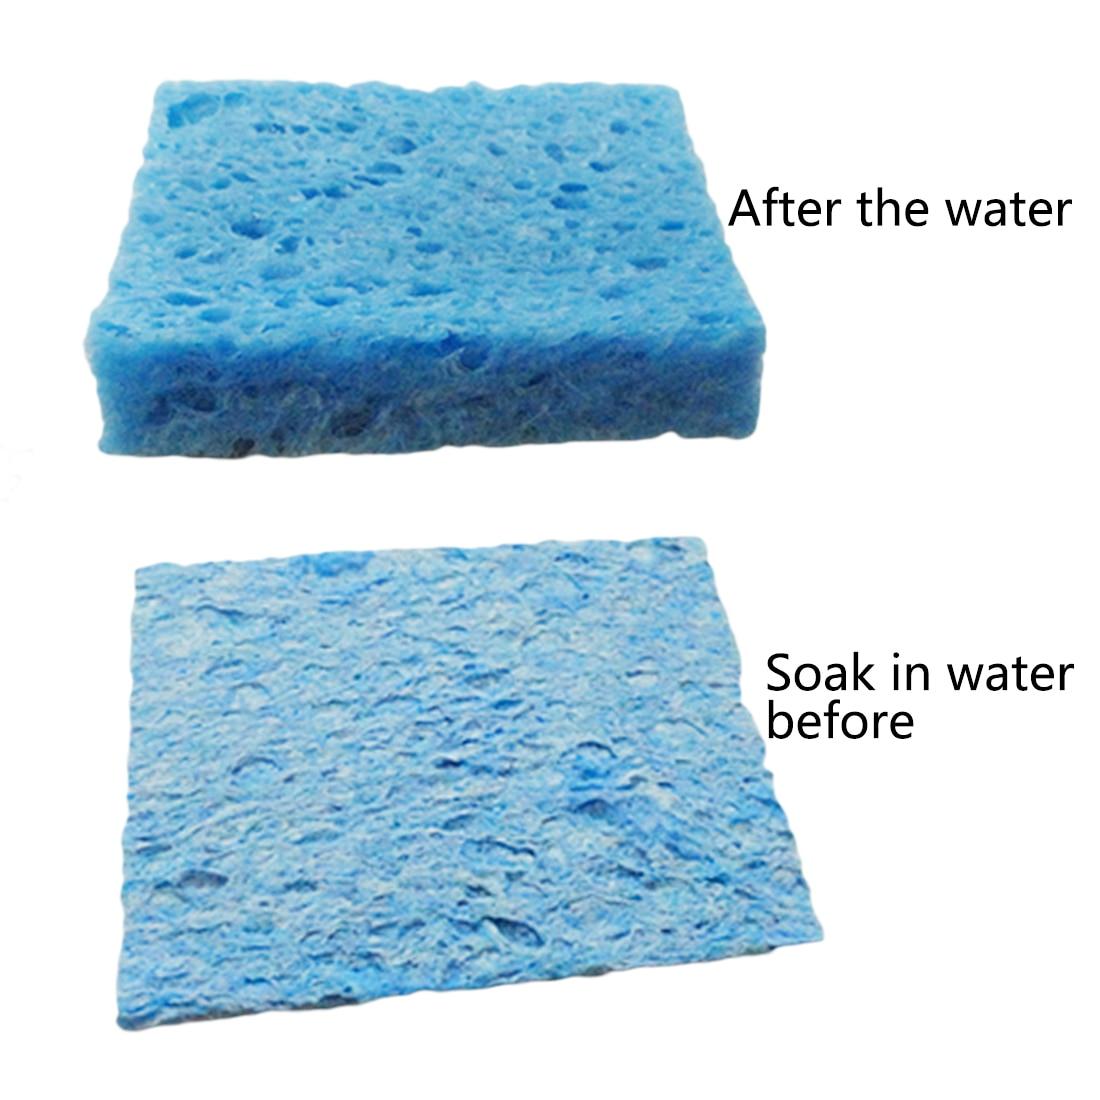 Hand Tool 5pcs/lot 6cm*6cm Soldering Iron Solder Tip Welding Cleaning Sponge Pads Universal Soldering Iron Color Random